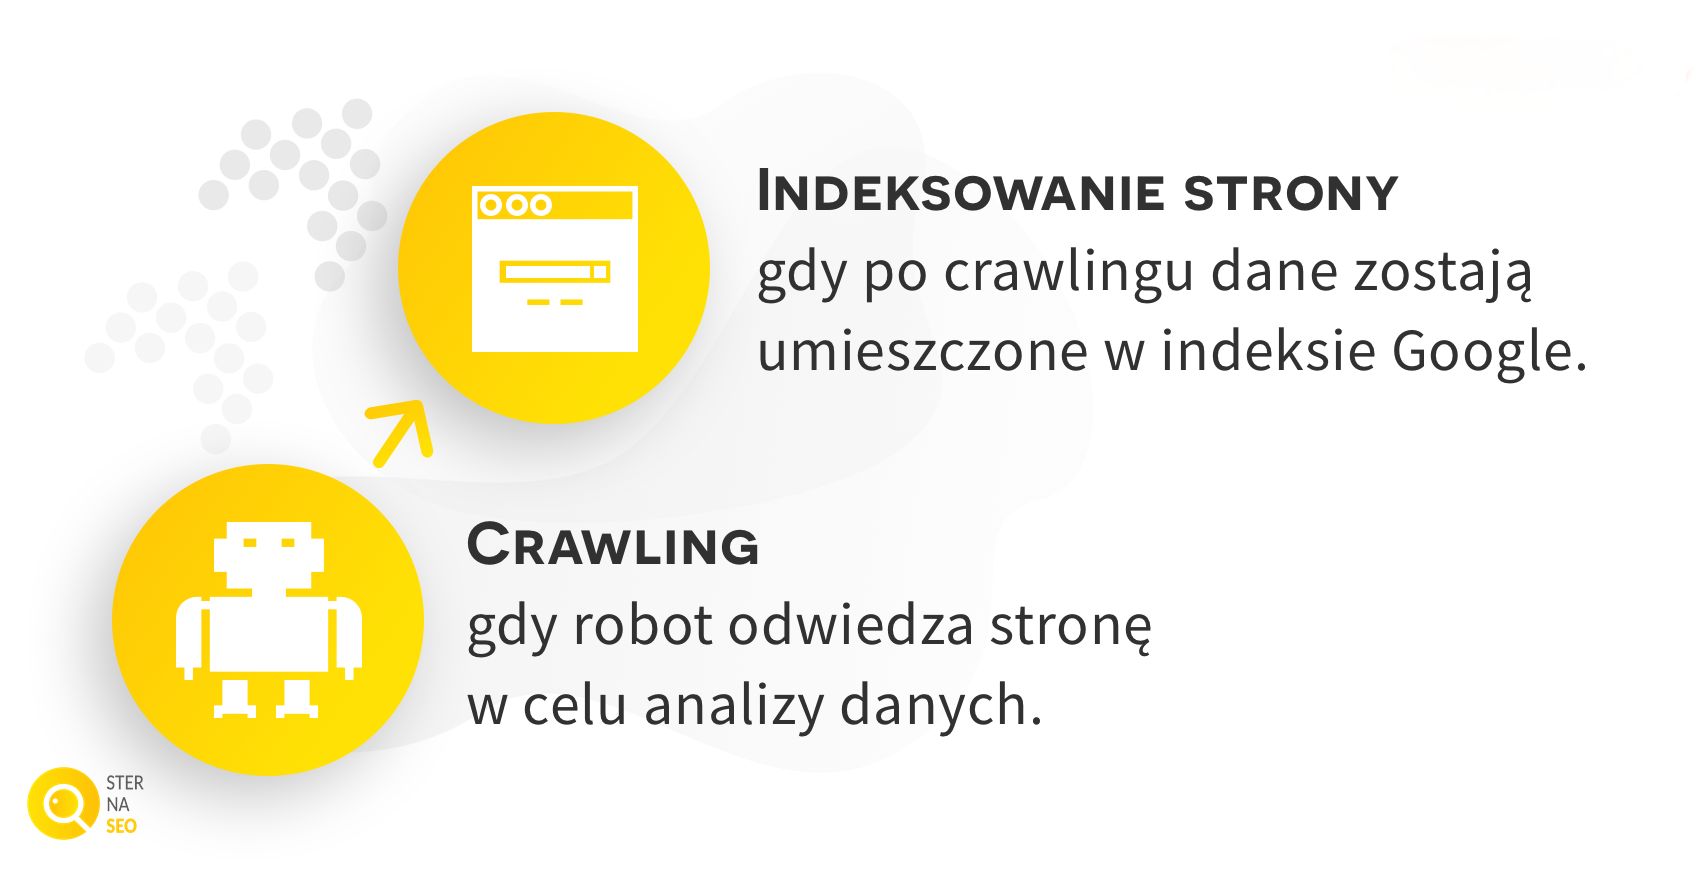 indeksowanie a crawling